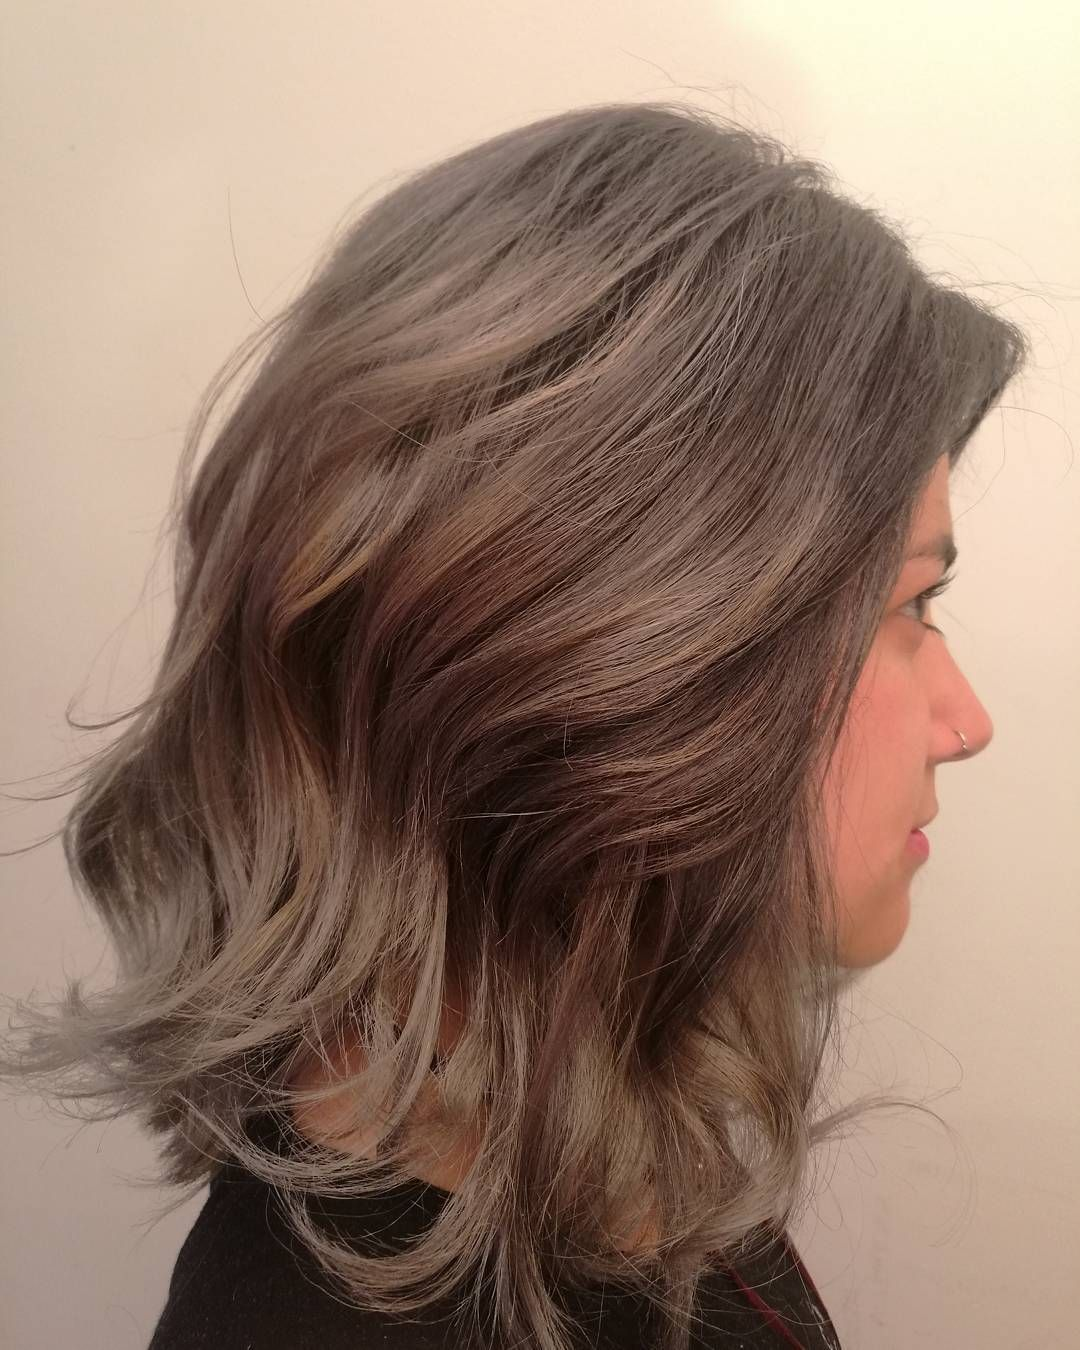 De ROJO a GRIS       Todo es posible en #pelukeroart  si se hace con una buena técnica.  #keroestilista #keropelukero #hairdresser #hairstyle